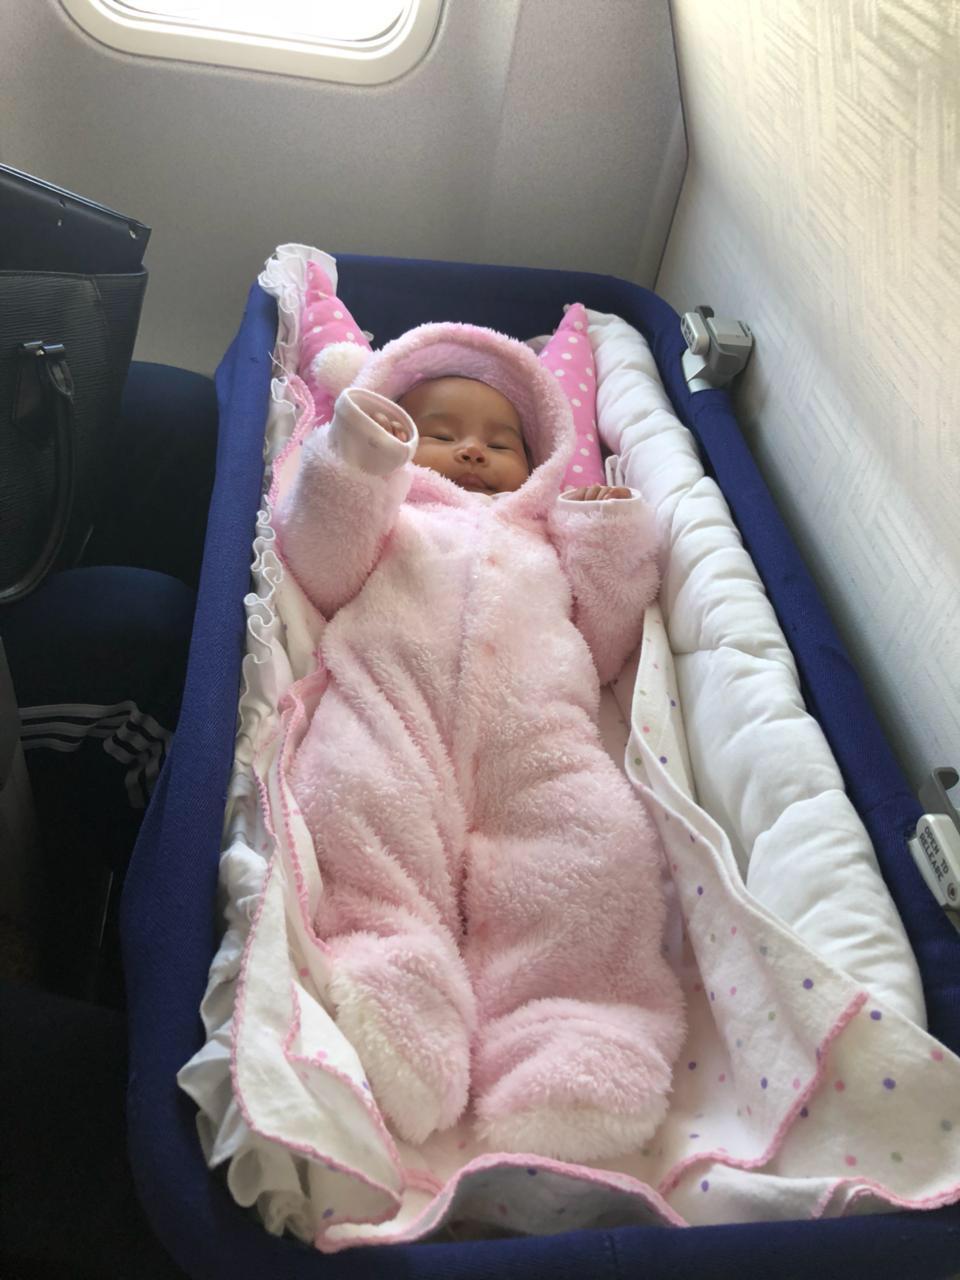 Baby basinett garuda